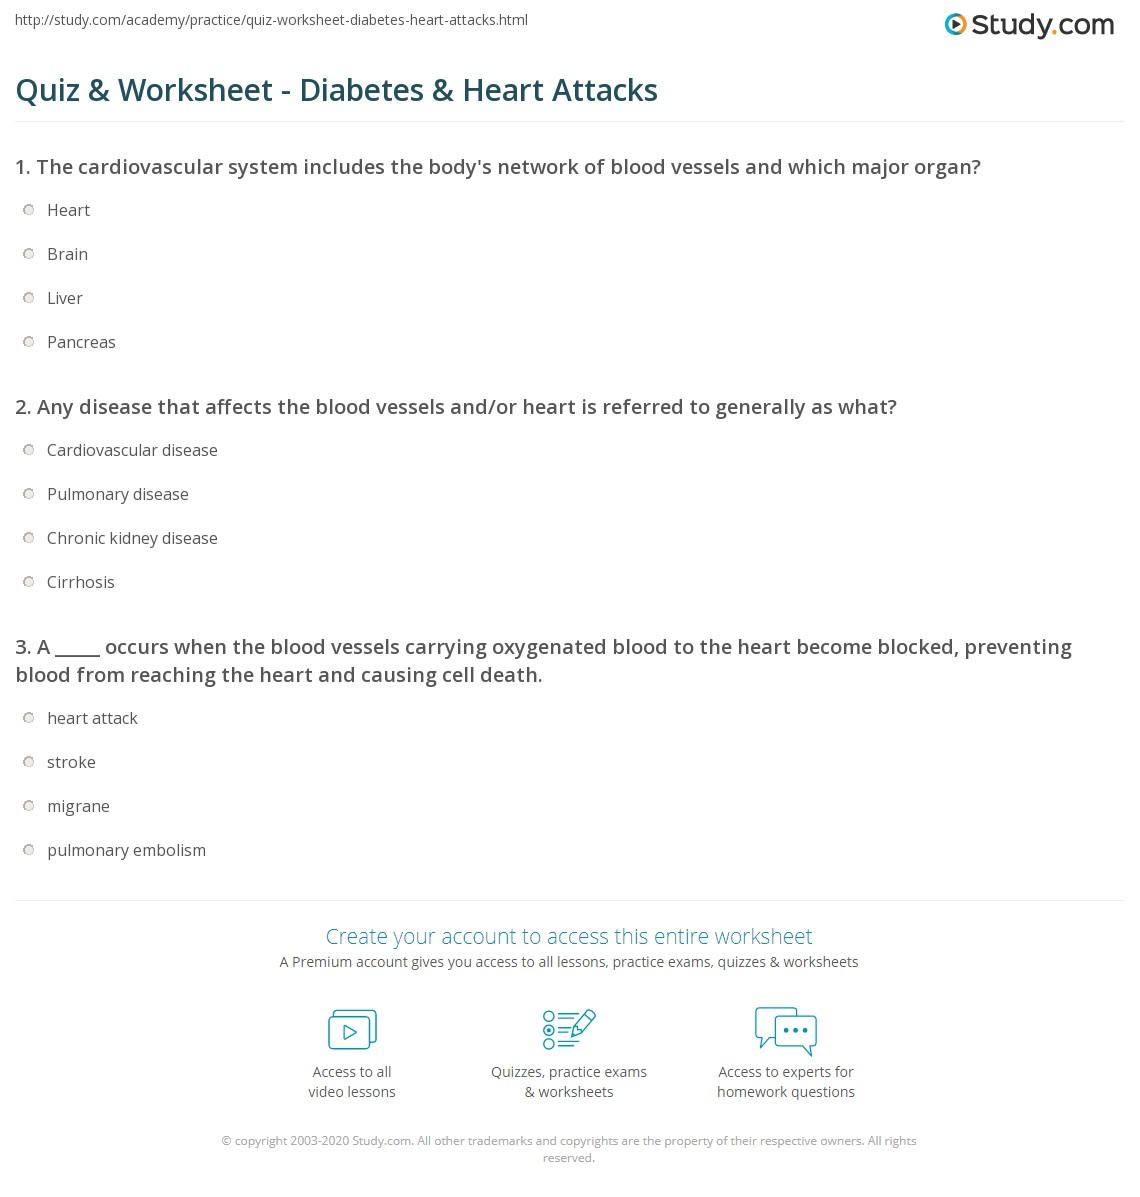 Quiz Worksheet Diabetes Heart Attacks Study